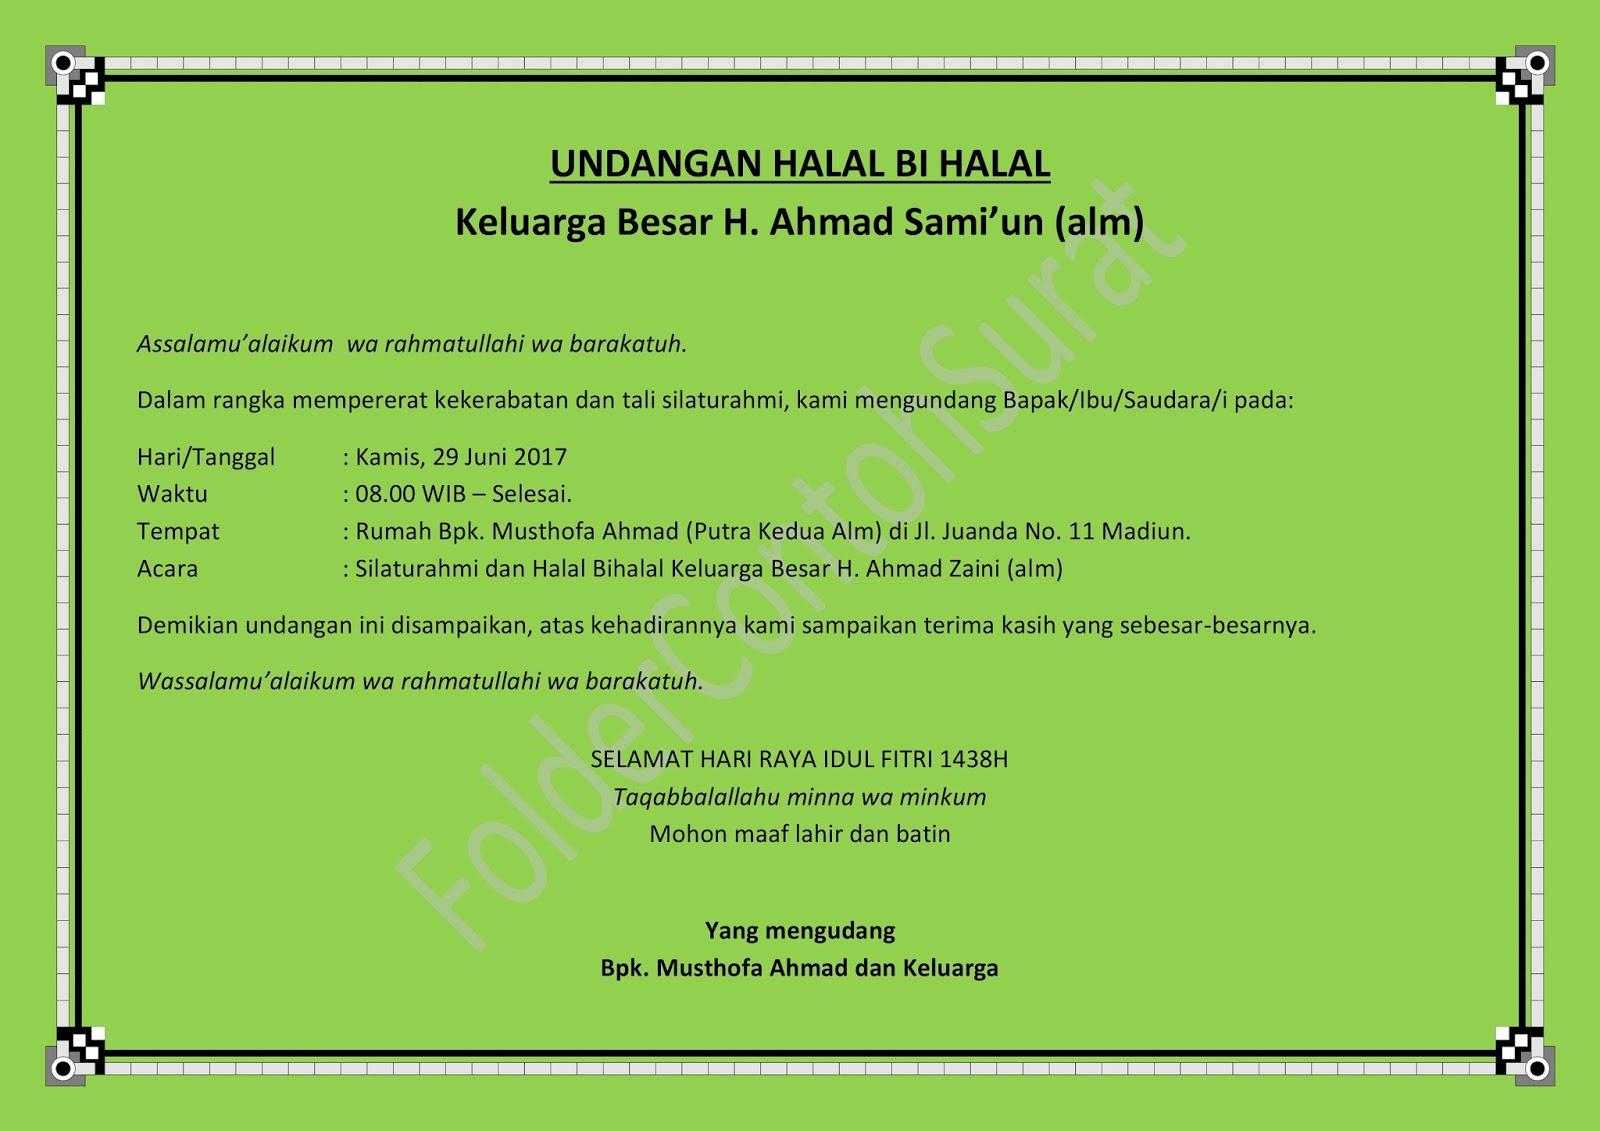 Desain Undangan Halal Bihalal